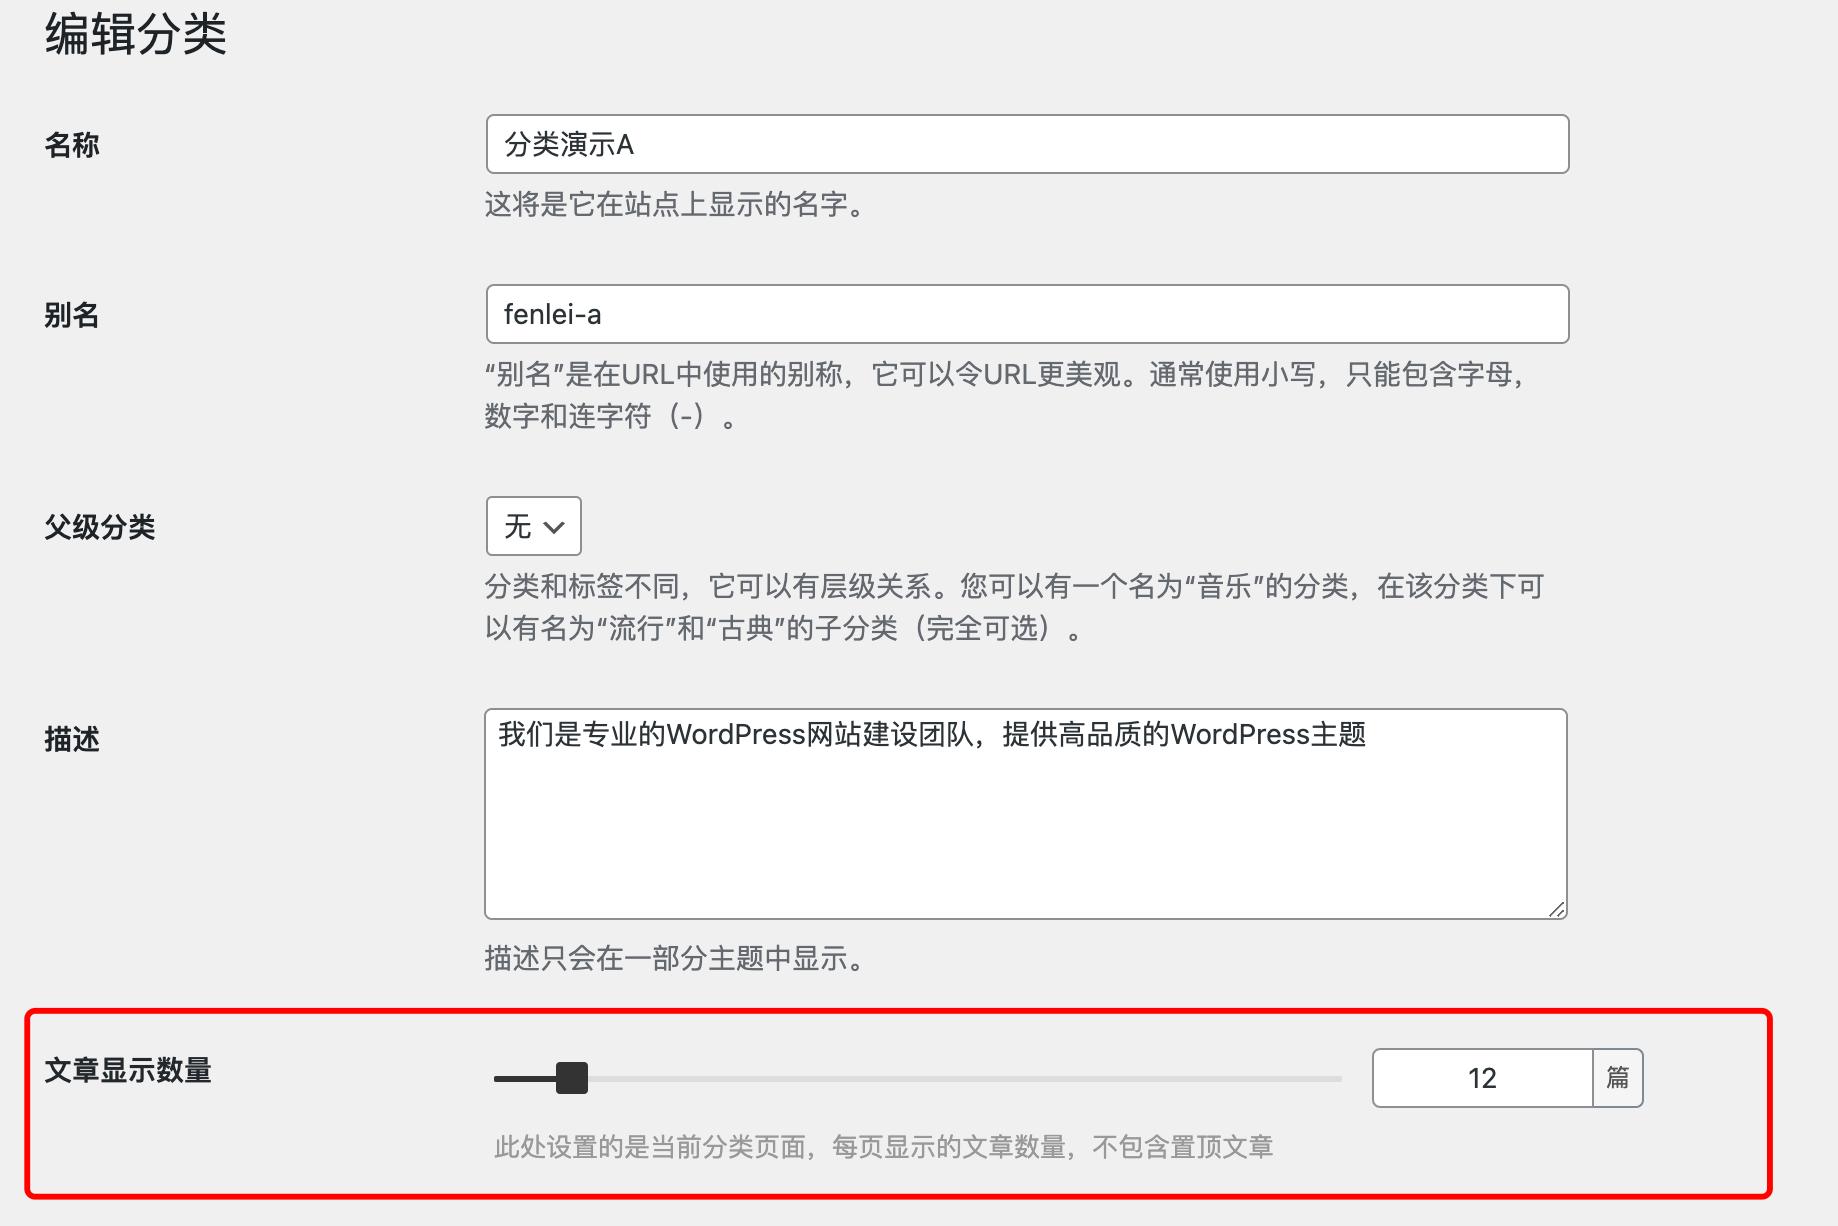 Zing-Pro主题4.0版本更新说明